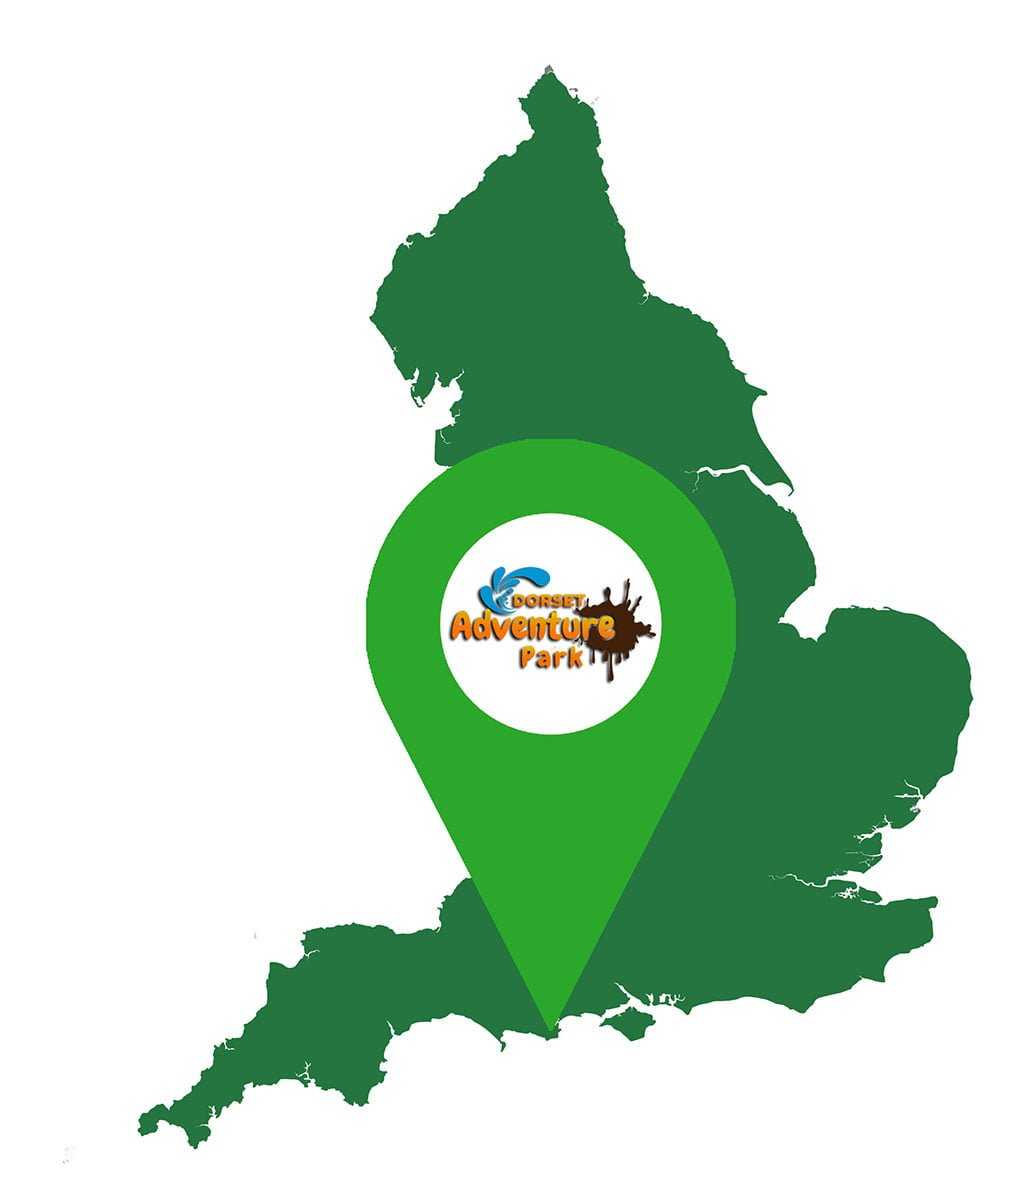 Map of Dorset Adventure Park